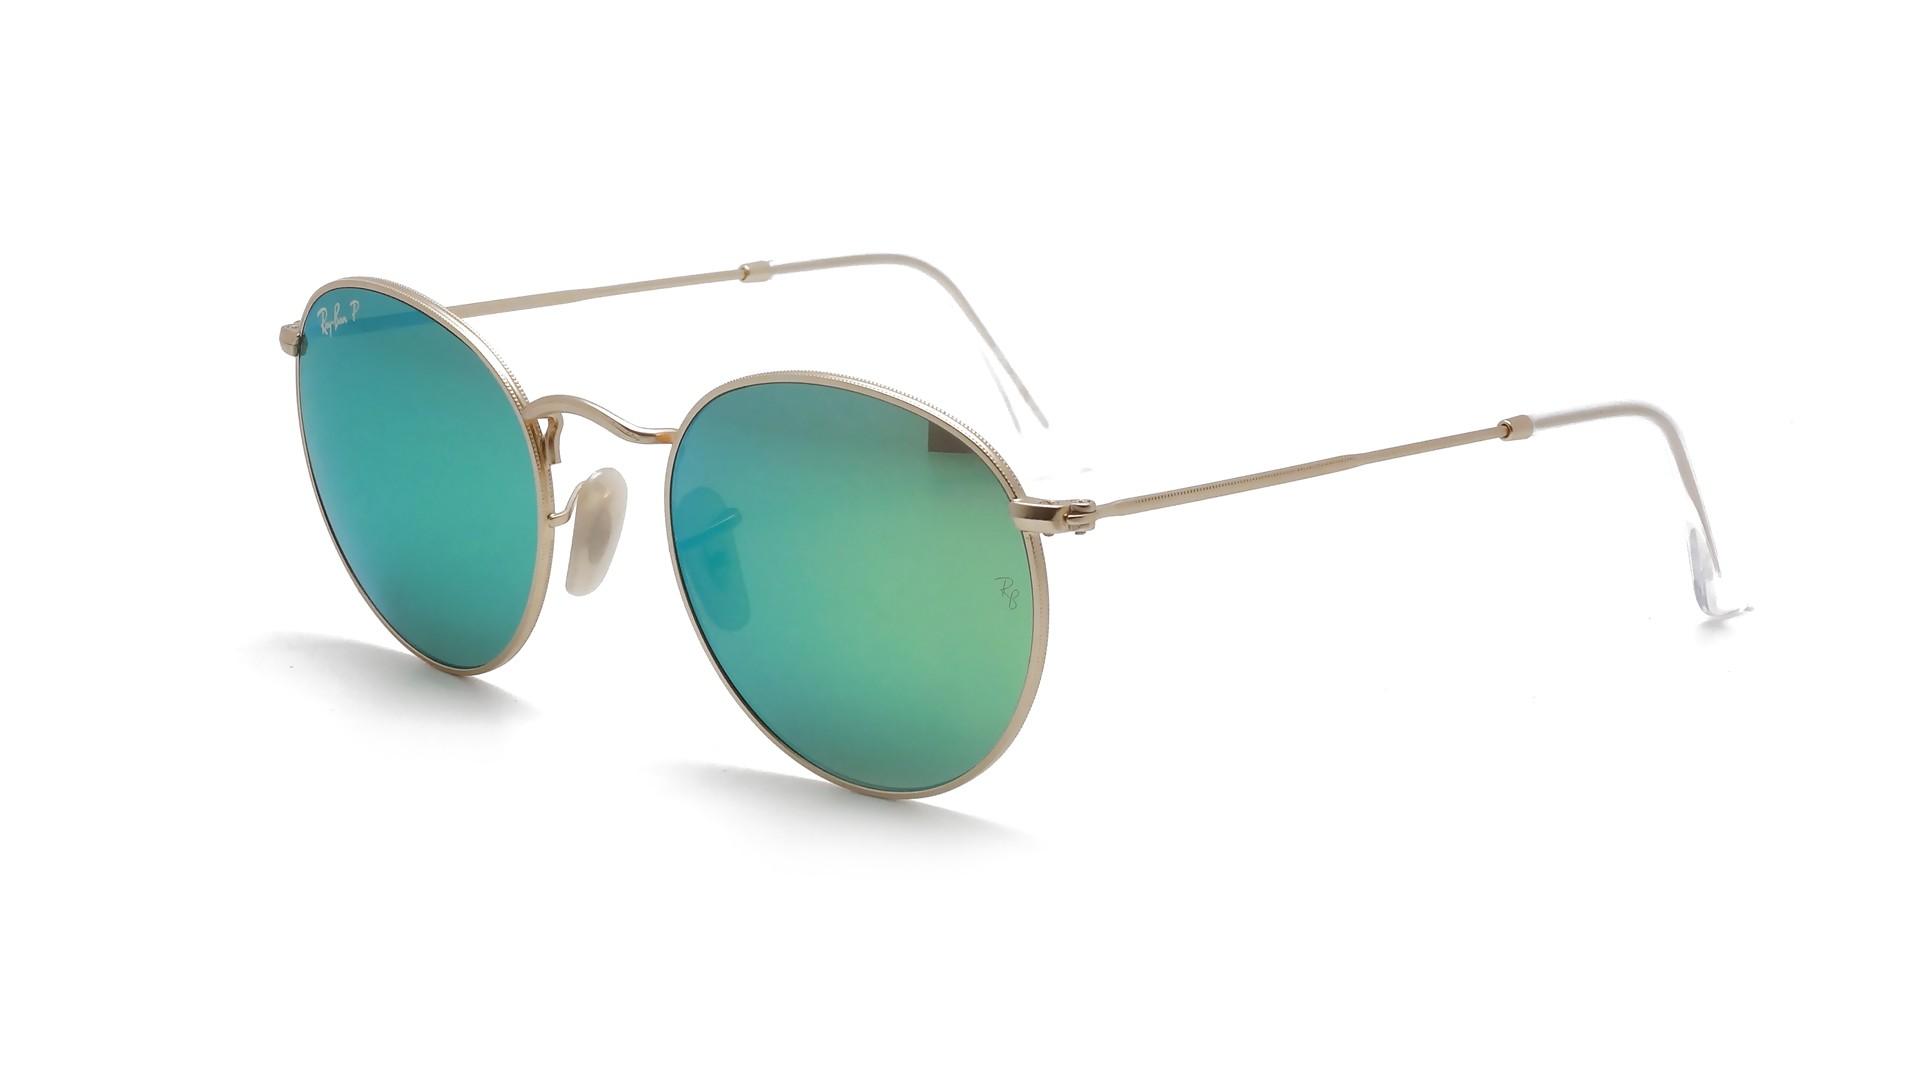 Sunglasses Ray-Ban Round Metal Gold Flash Lenses RB3447 112 P9 50-21 Medium  Polarized Mirror 66403f6baf